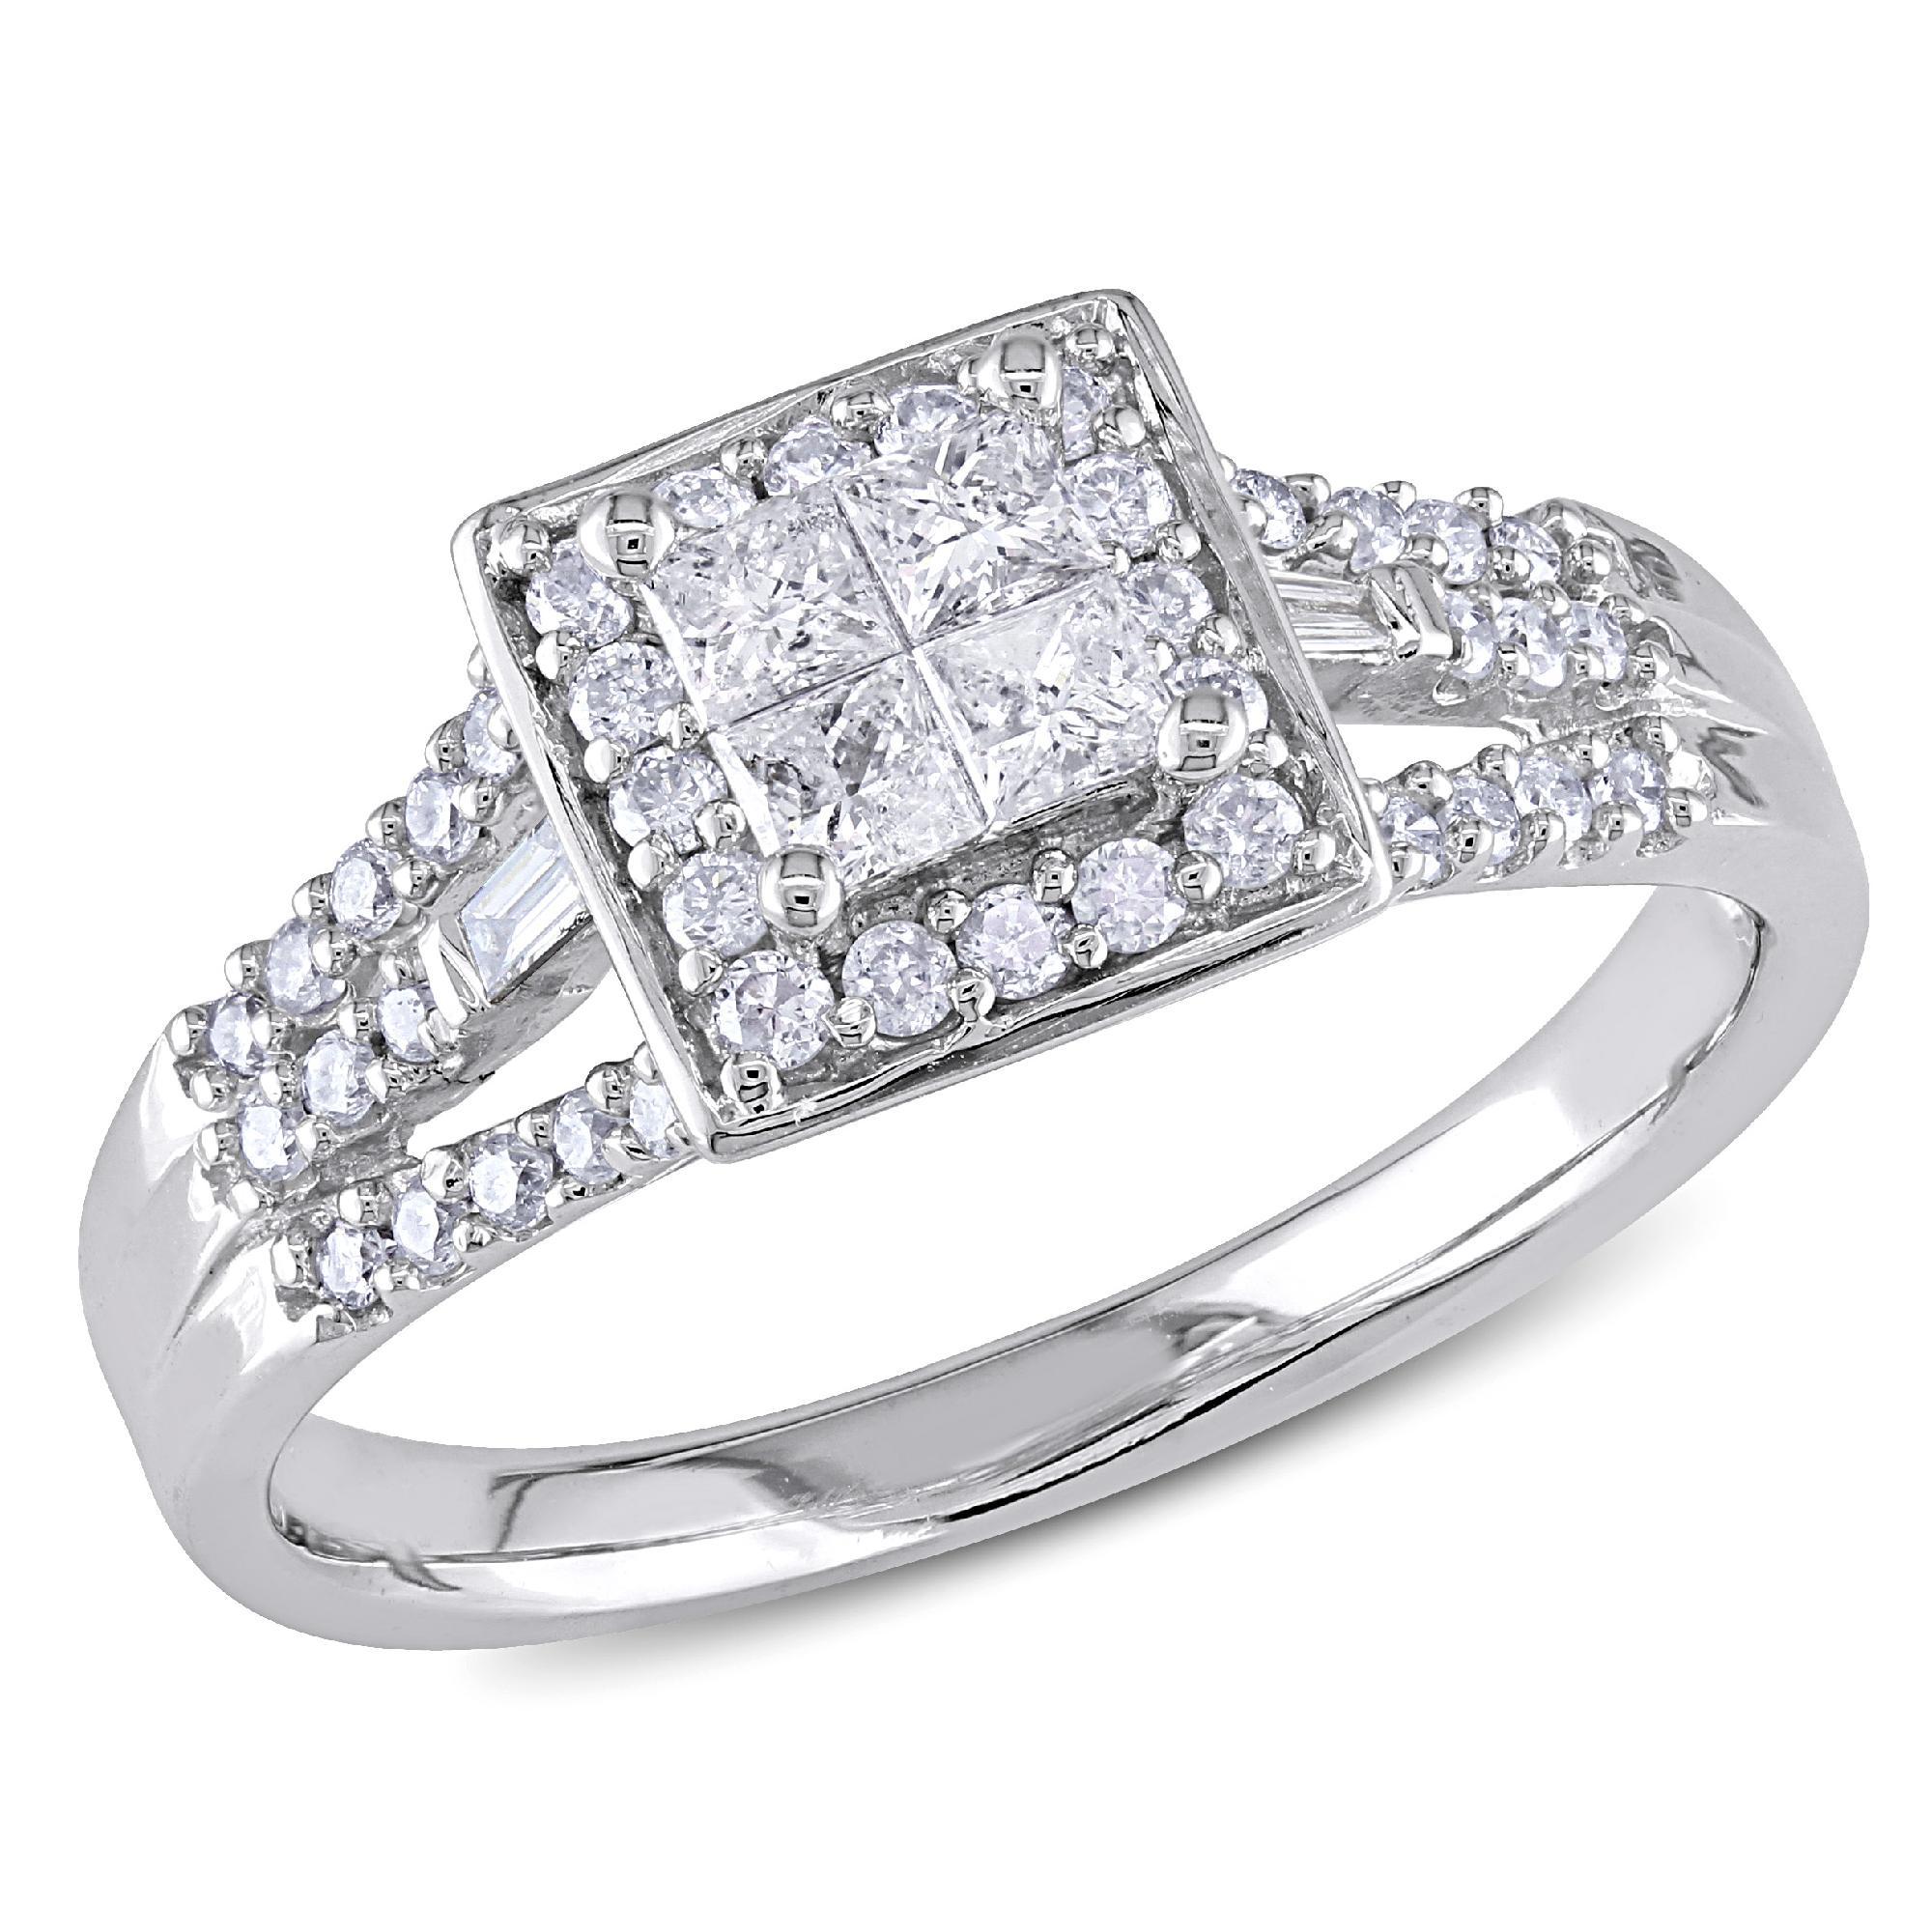 10k White Gold 0.53 CTTW Diamond Engagement Ring